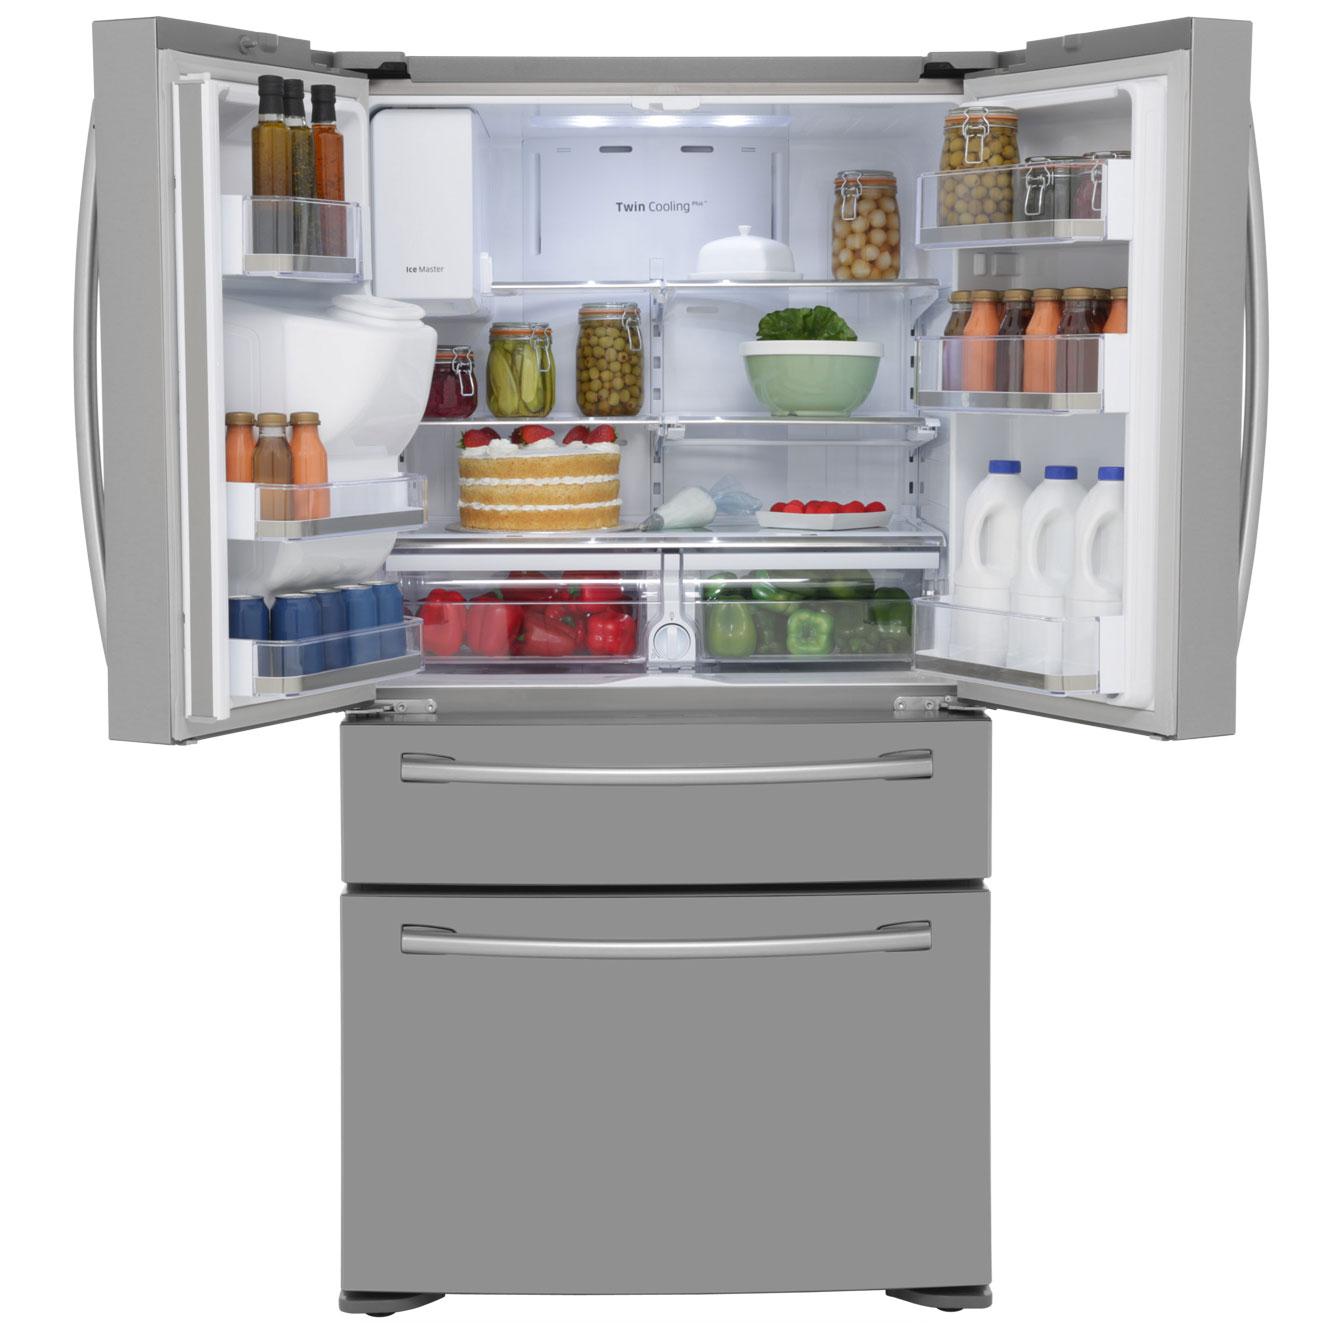 Samsung American Fridge Freezer Rf24fsedbsr Ao